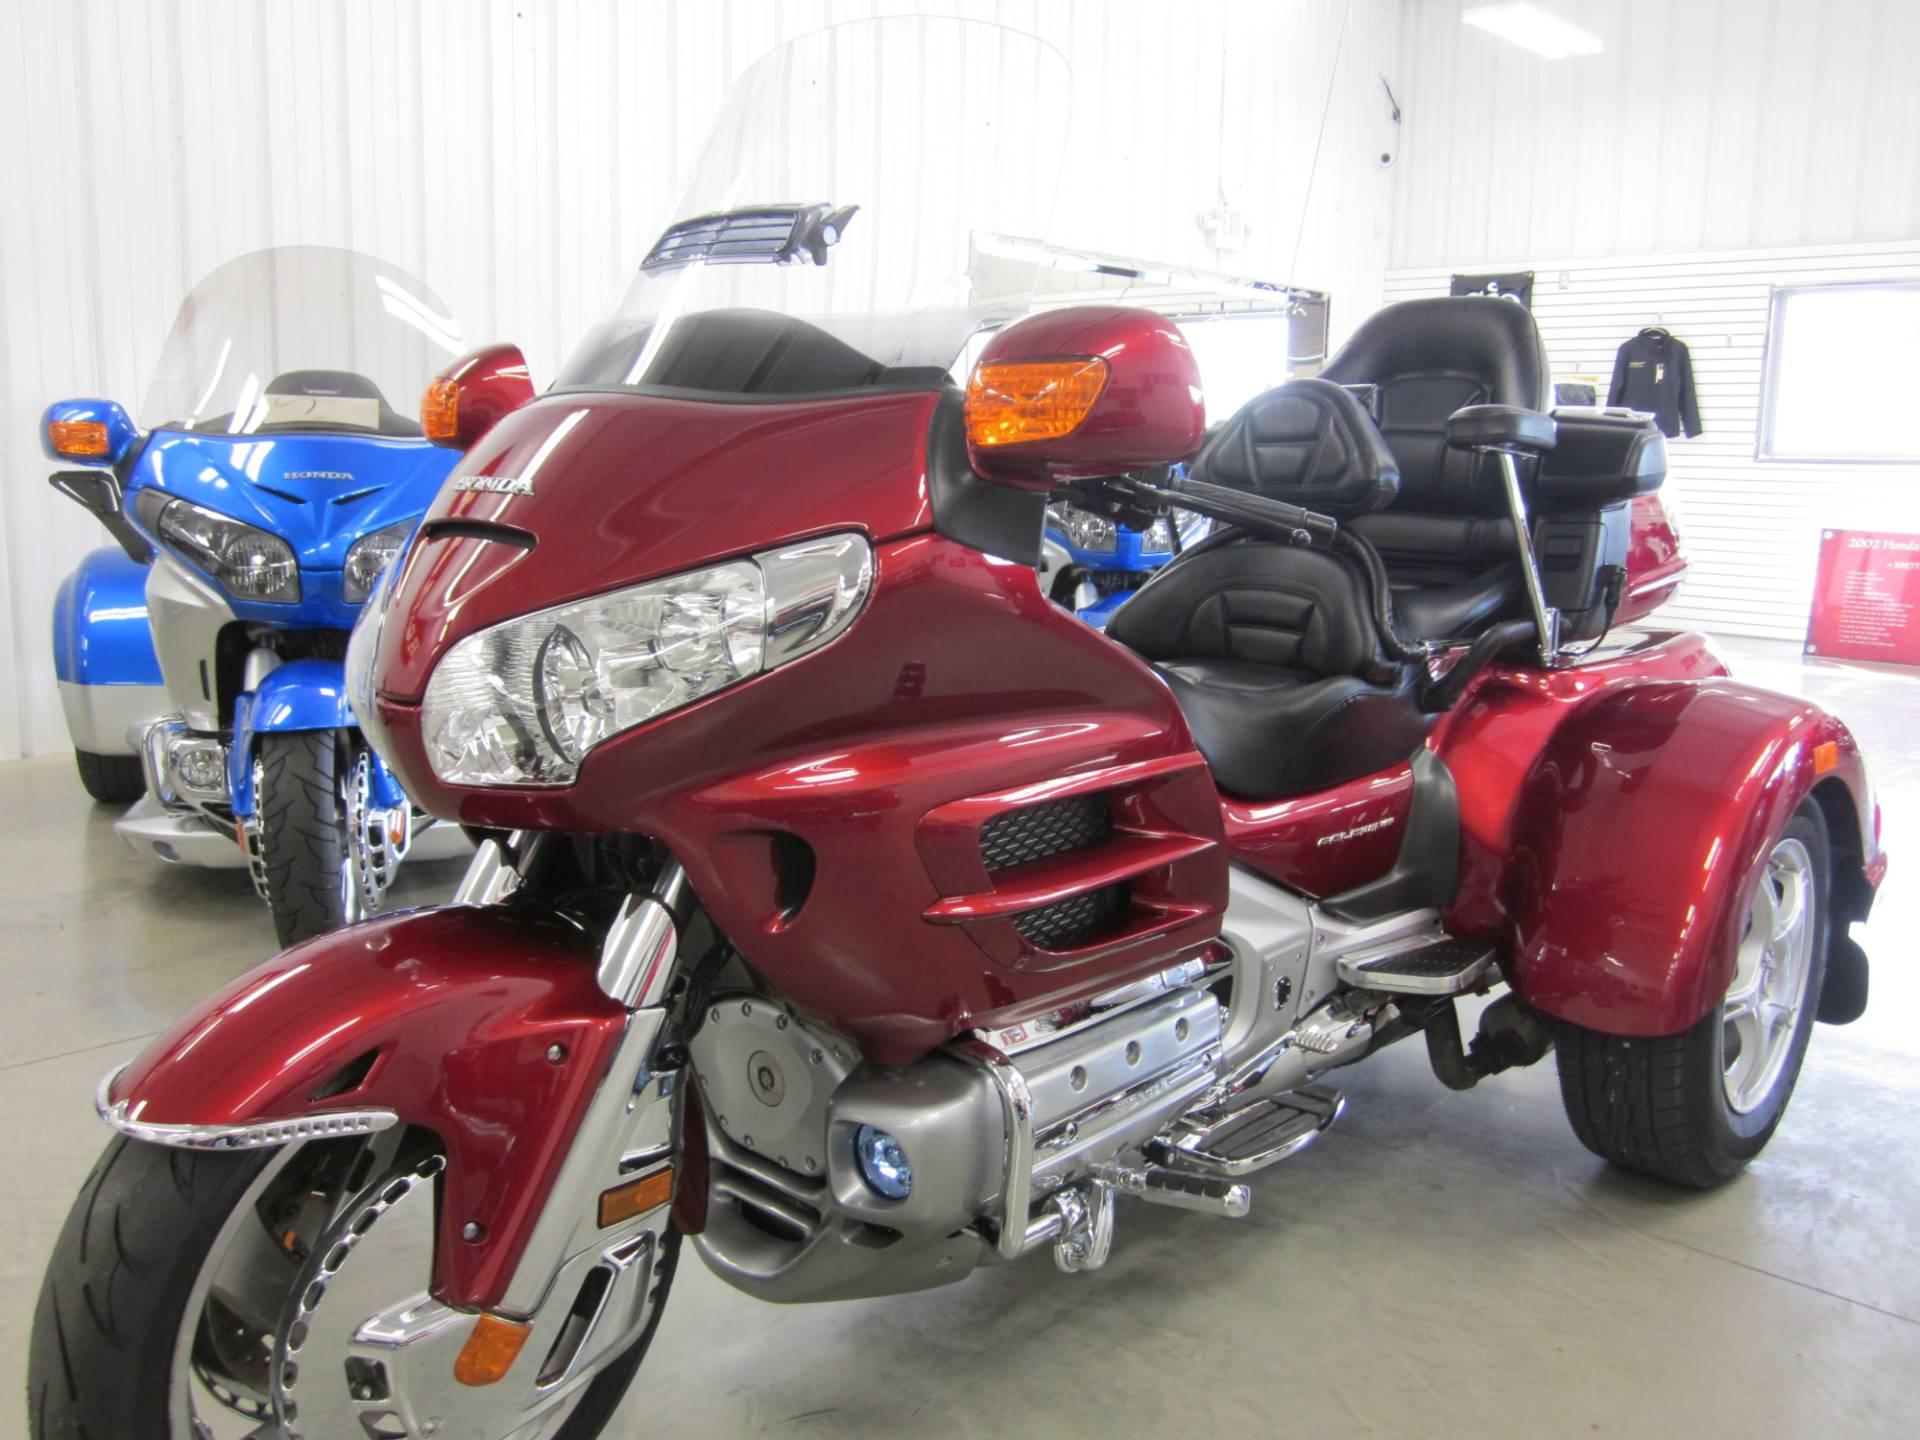 2010 Lehman Trikes/Honda Gl1800 Lehman Monarch II Trike in Lima, Ohio